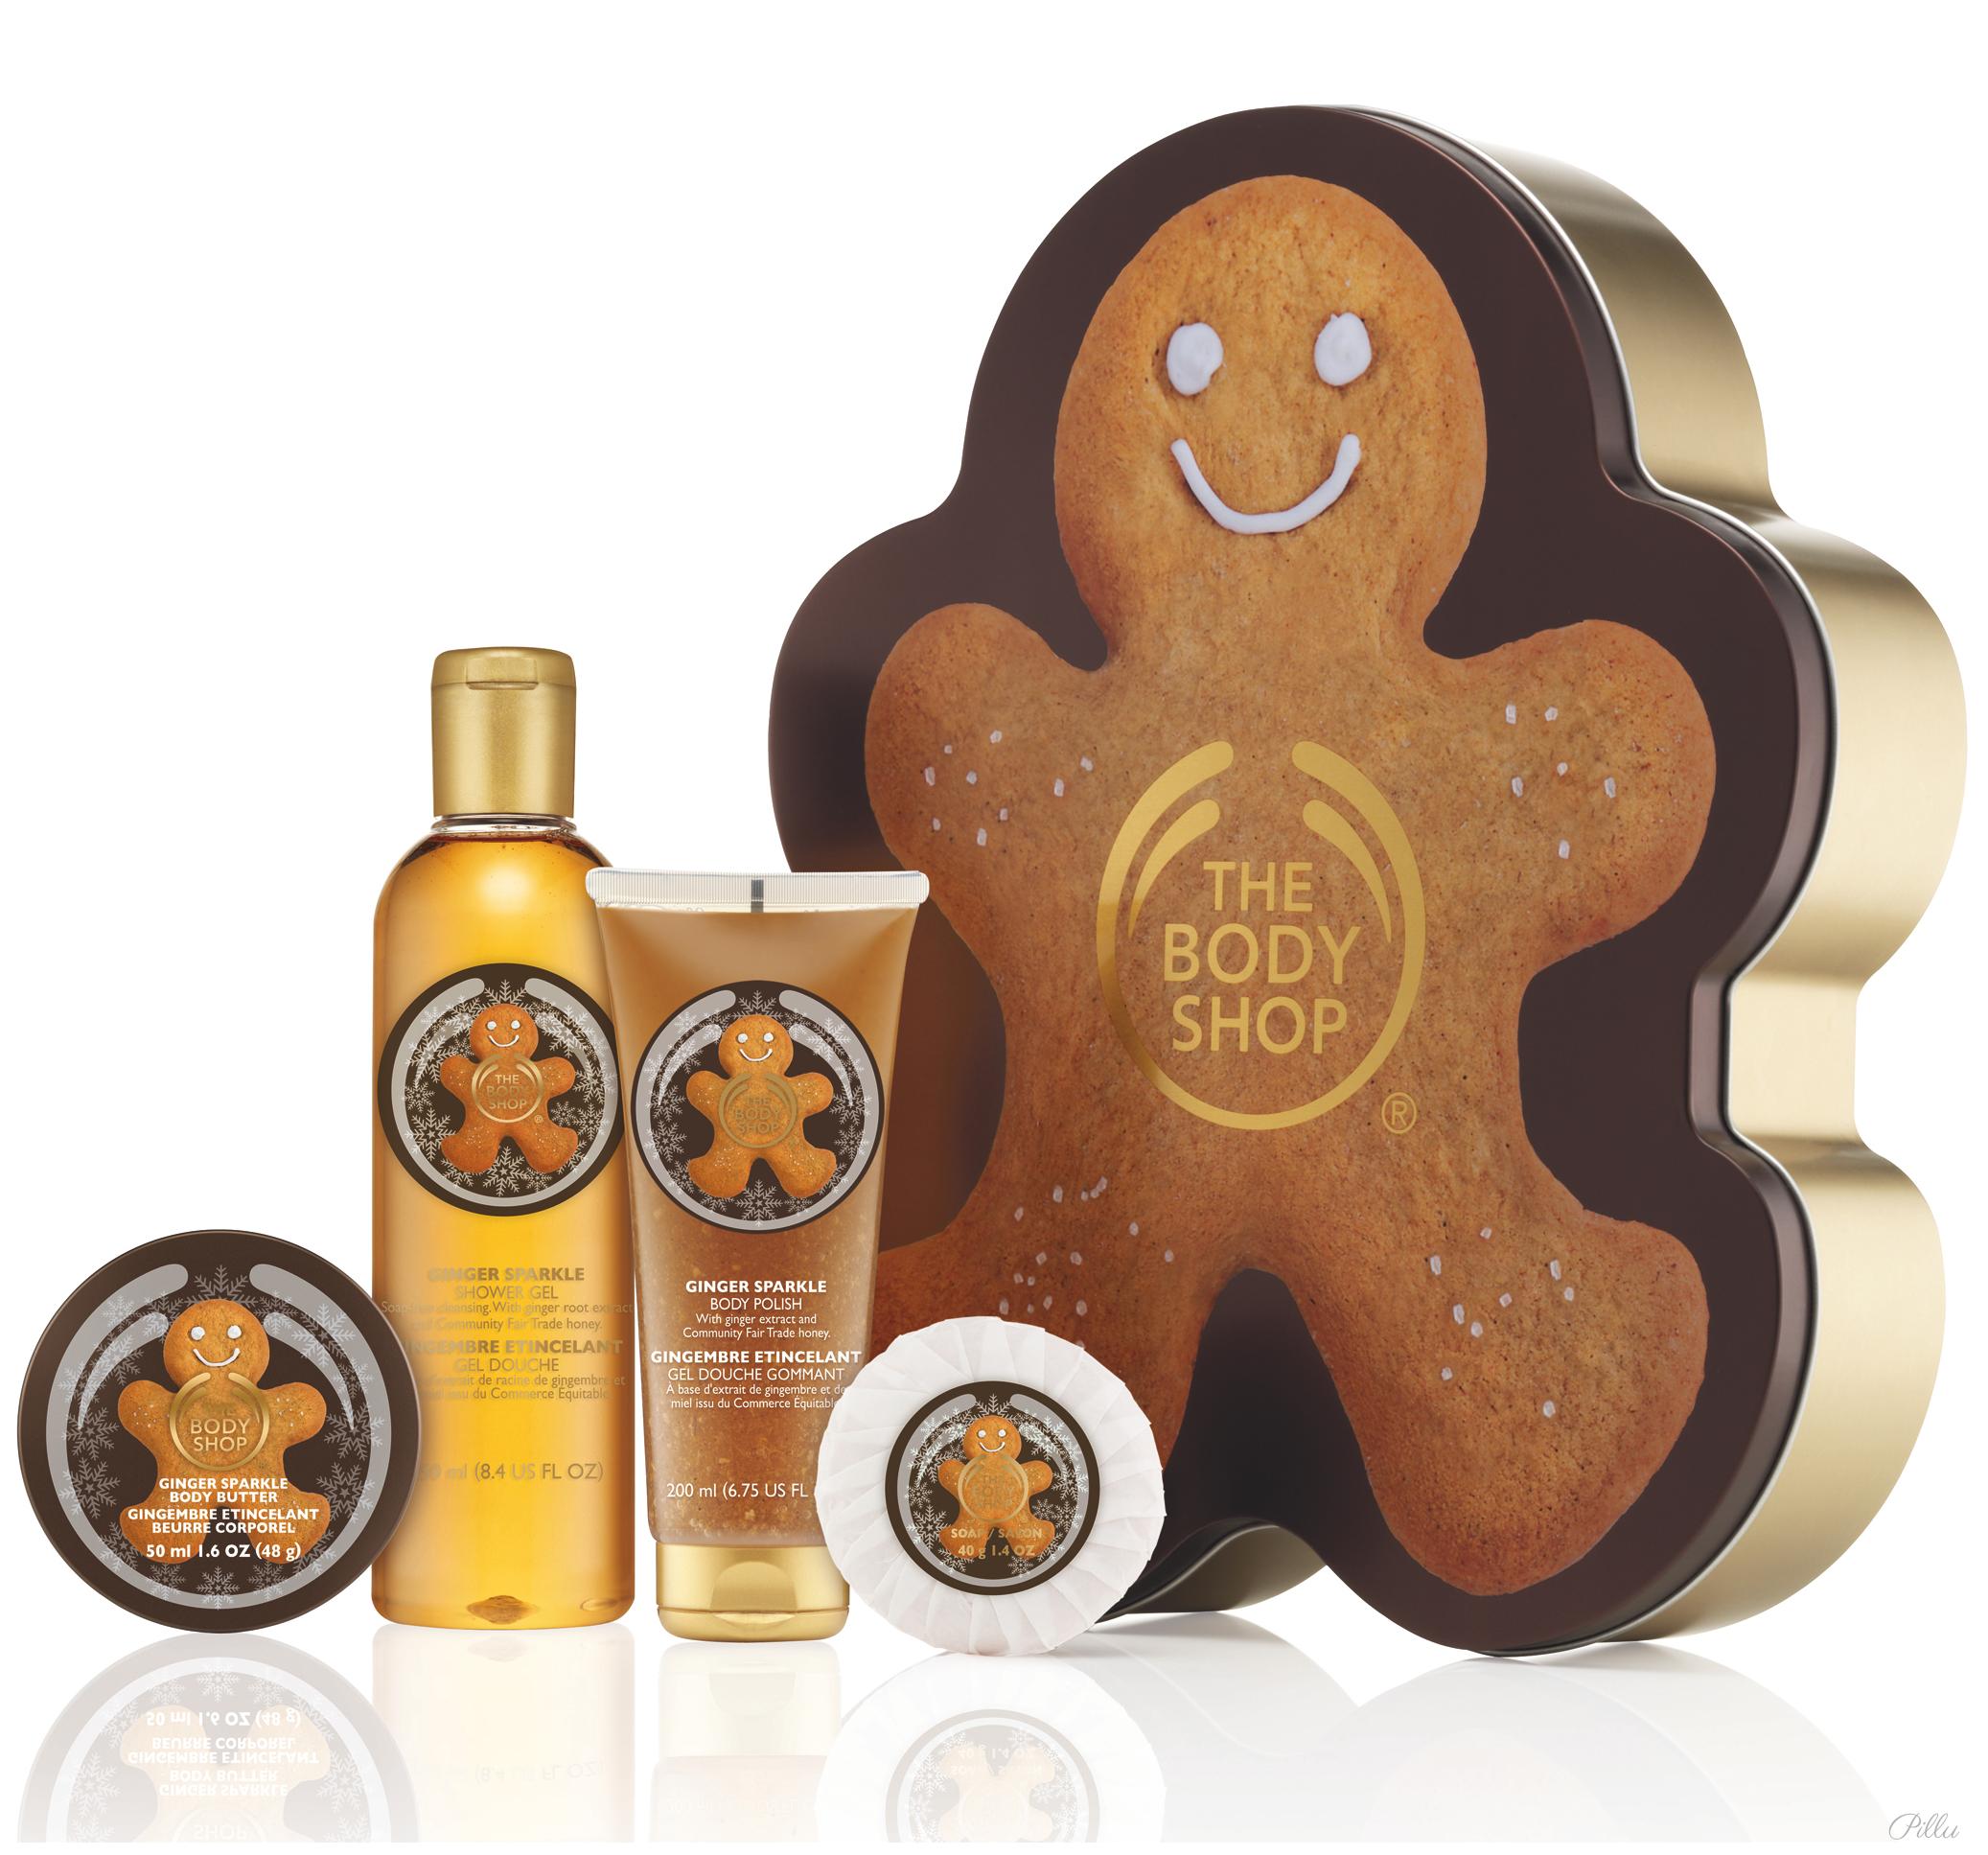 The Body Shop Christmas gingerbread range. I'm using it